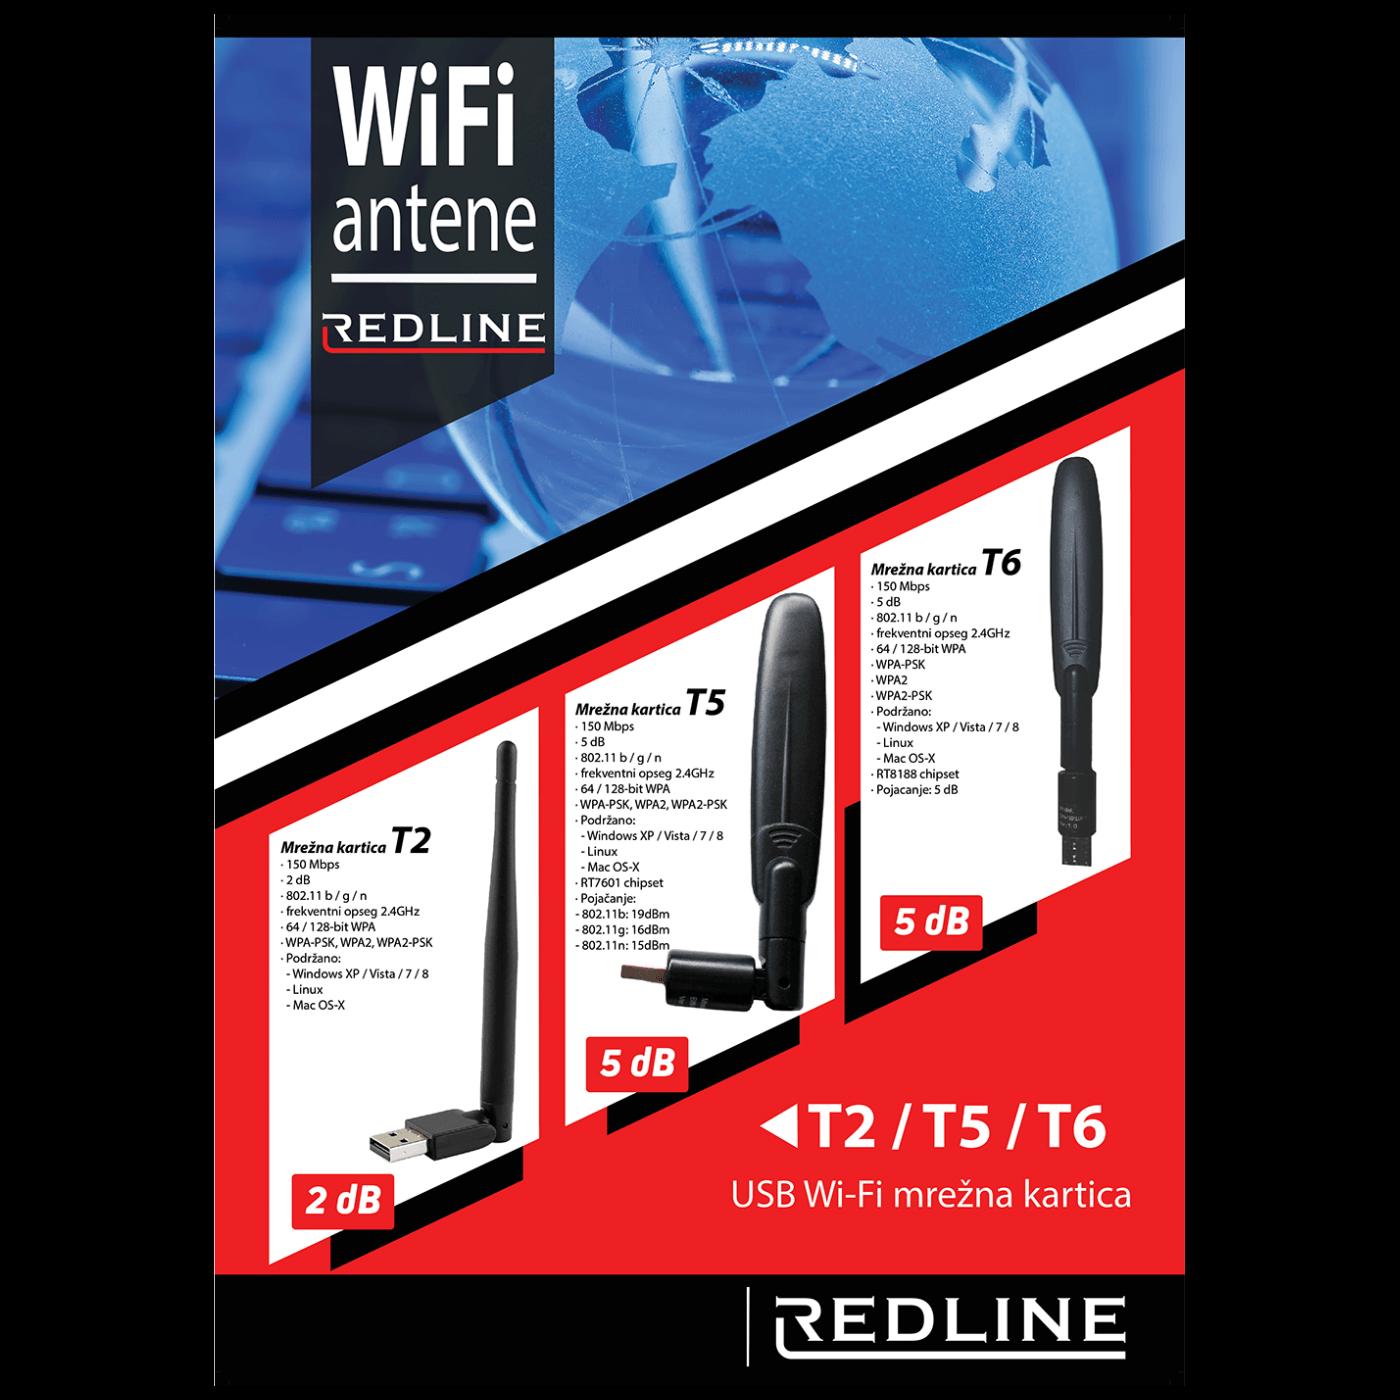 Wi-Fi mrežna kartica, USB, 2.4 GHz, 5 dB, 150 Mbps, RTL8188